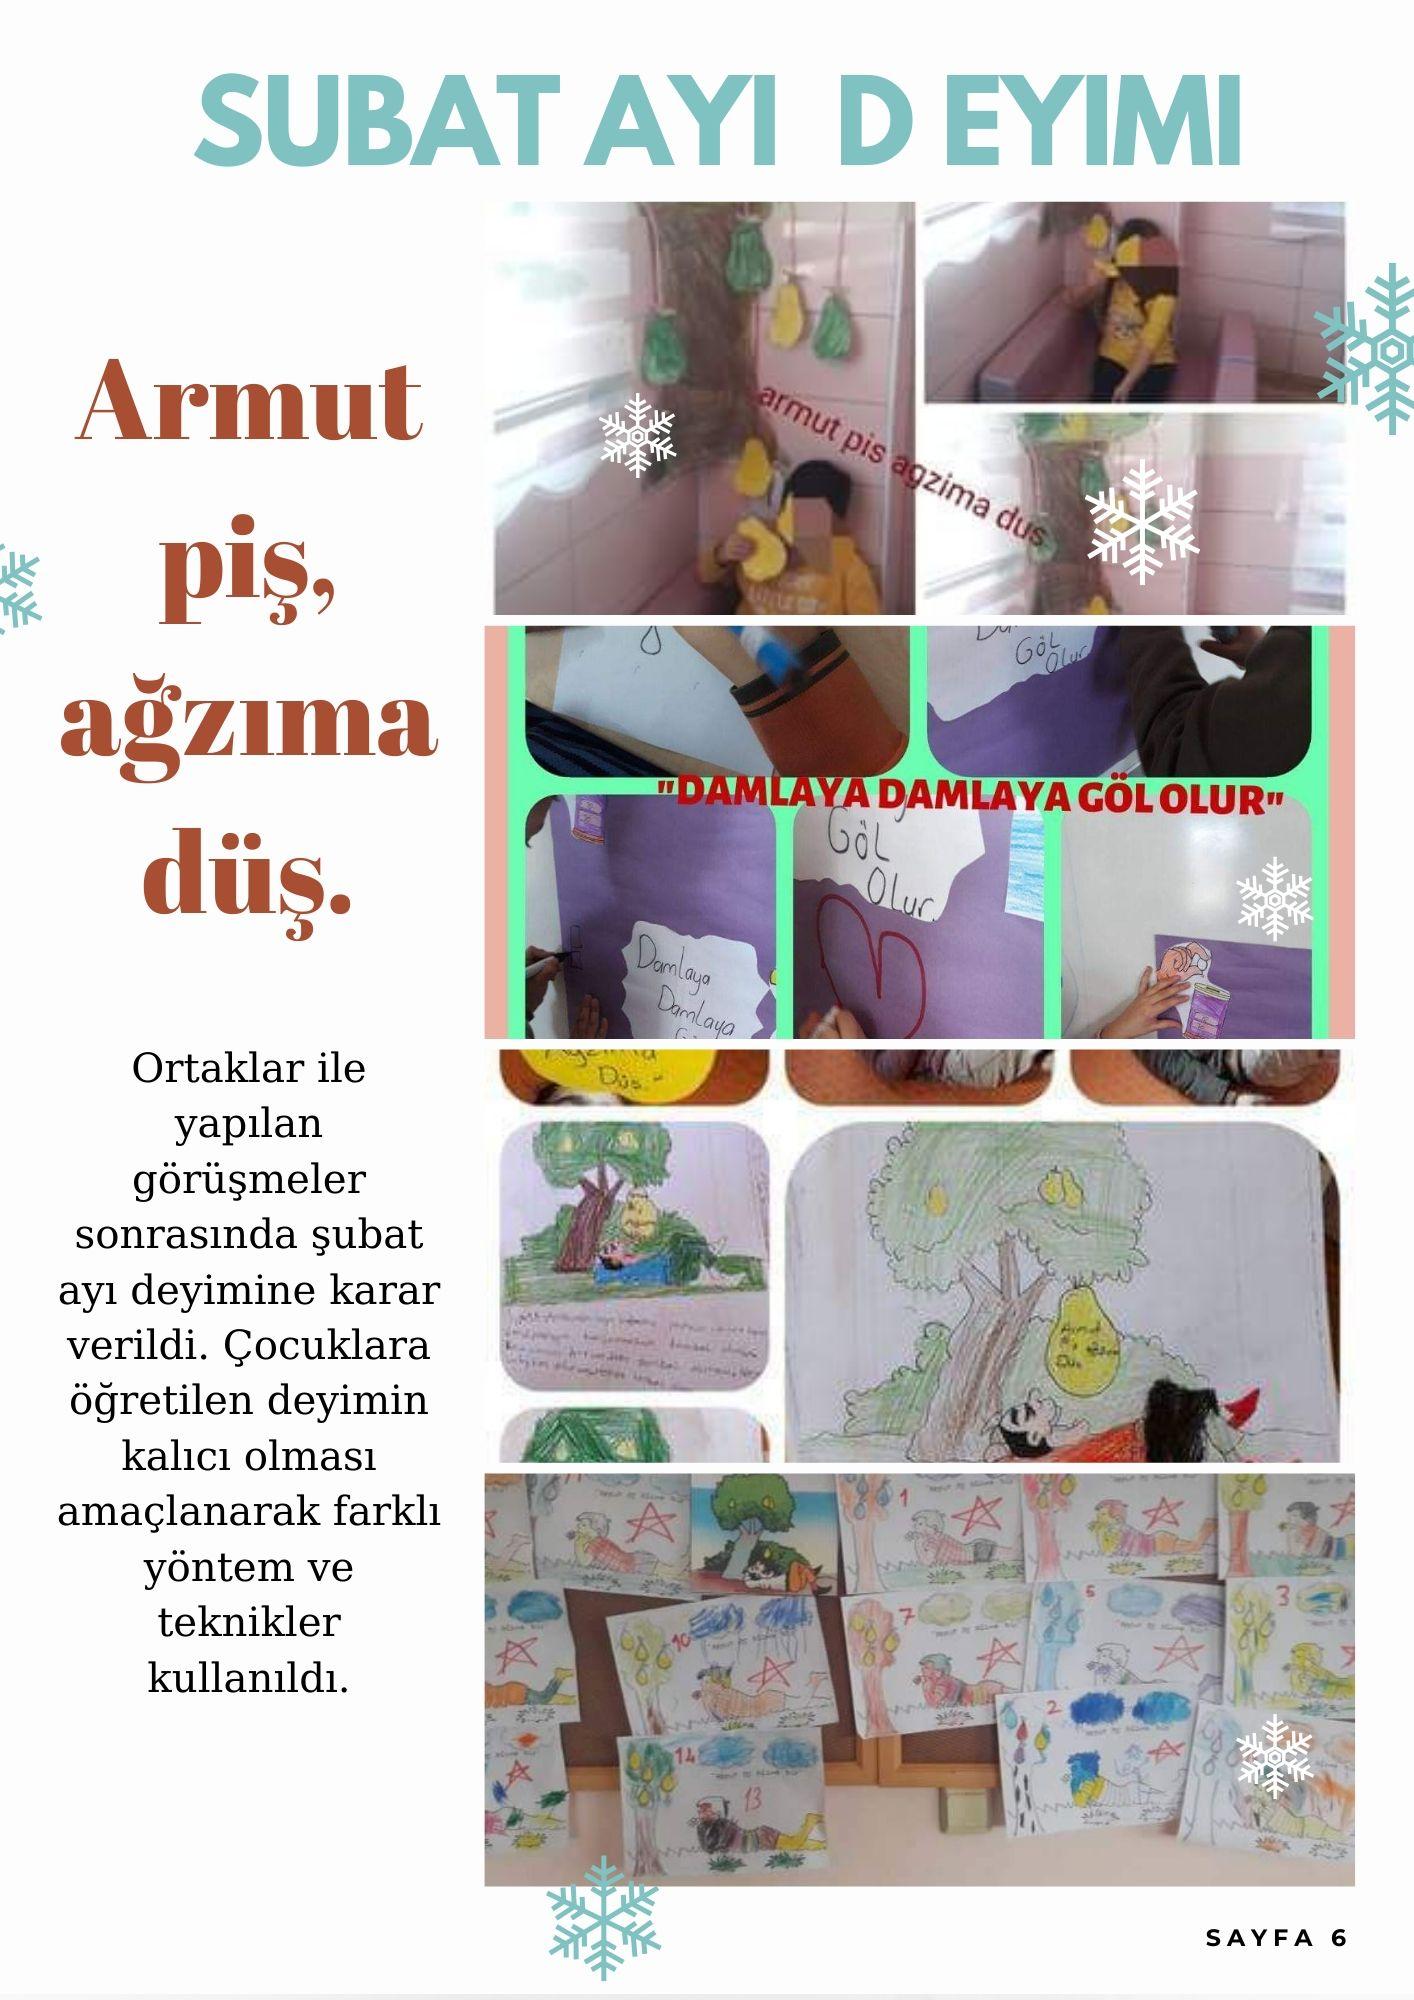 KULAGA KÜPE OLAN SÖZLER by zeynep - Illustrated by E DERGİ - Ourboox.com